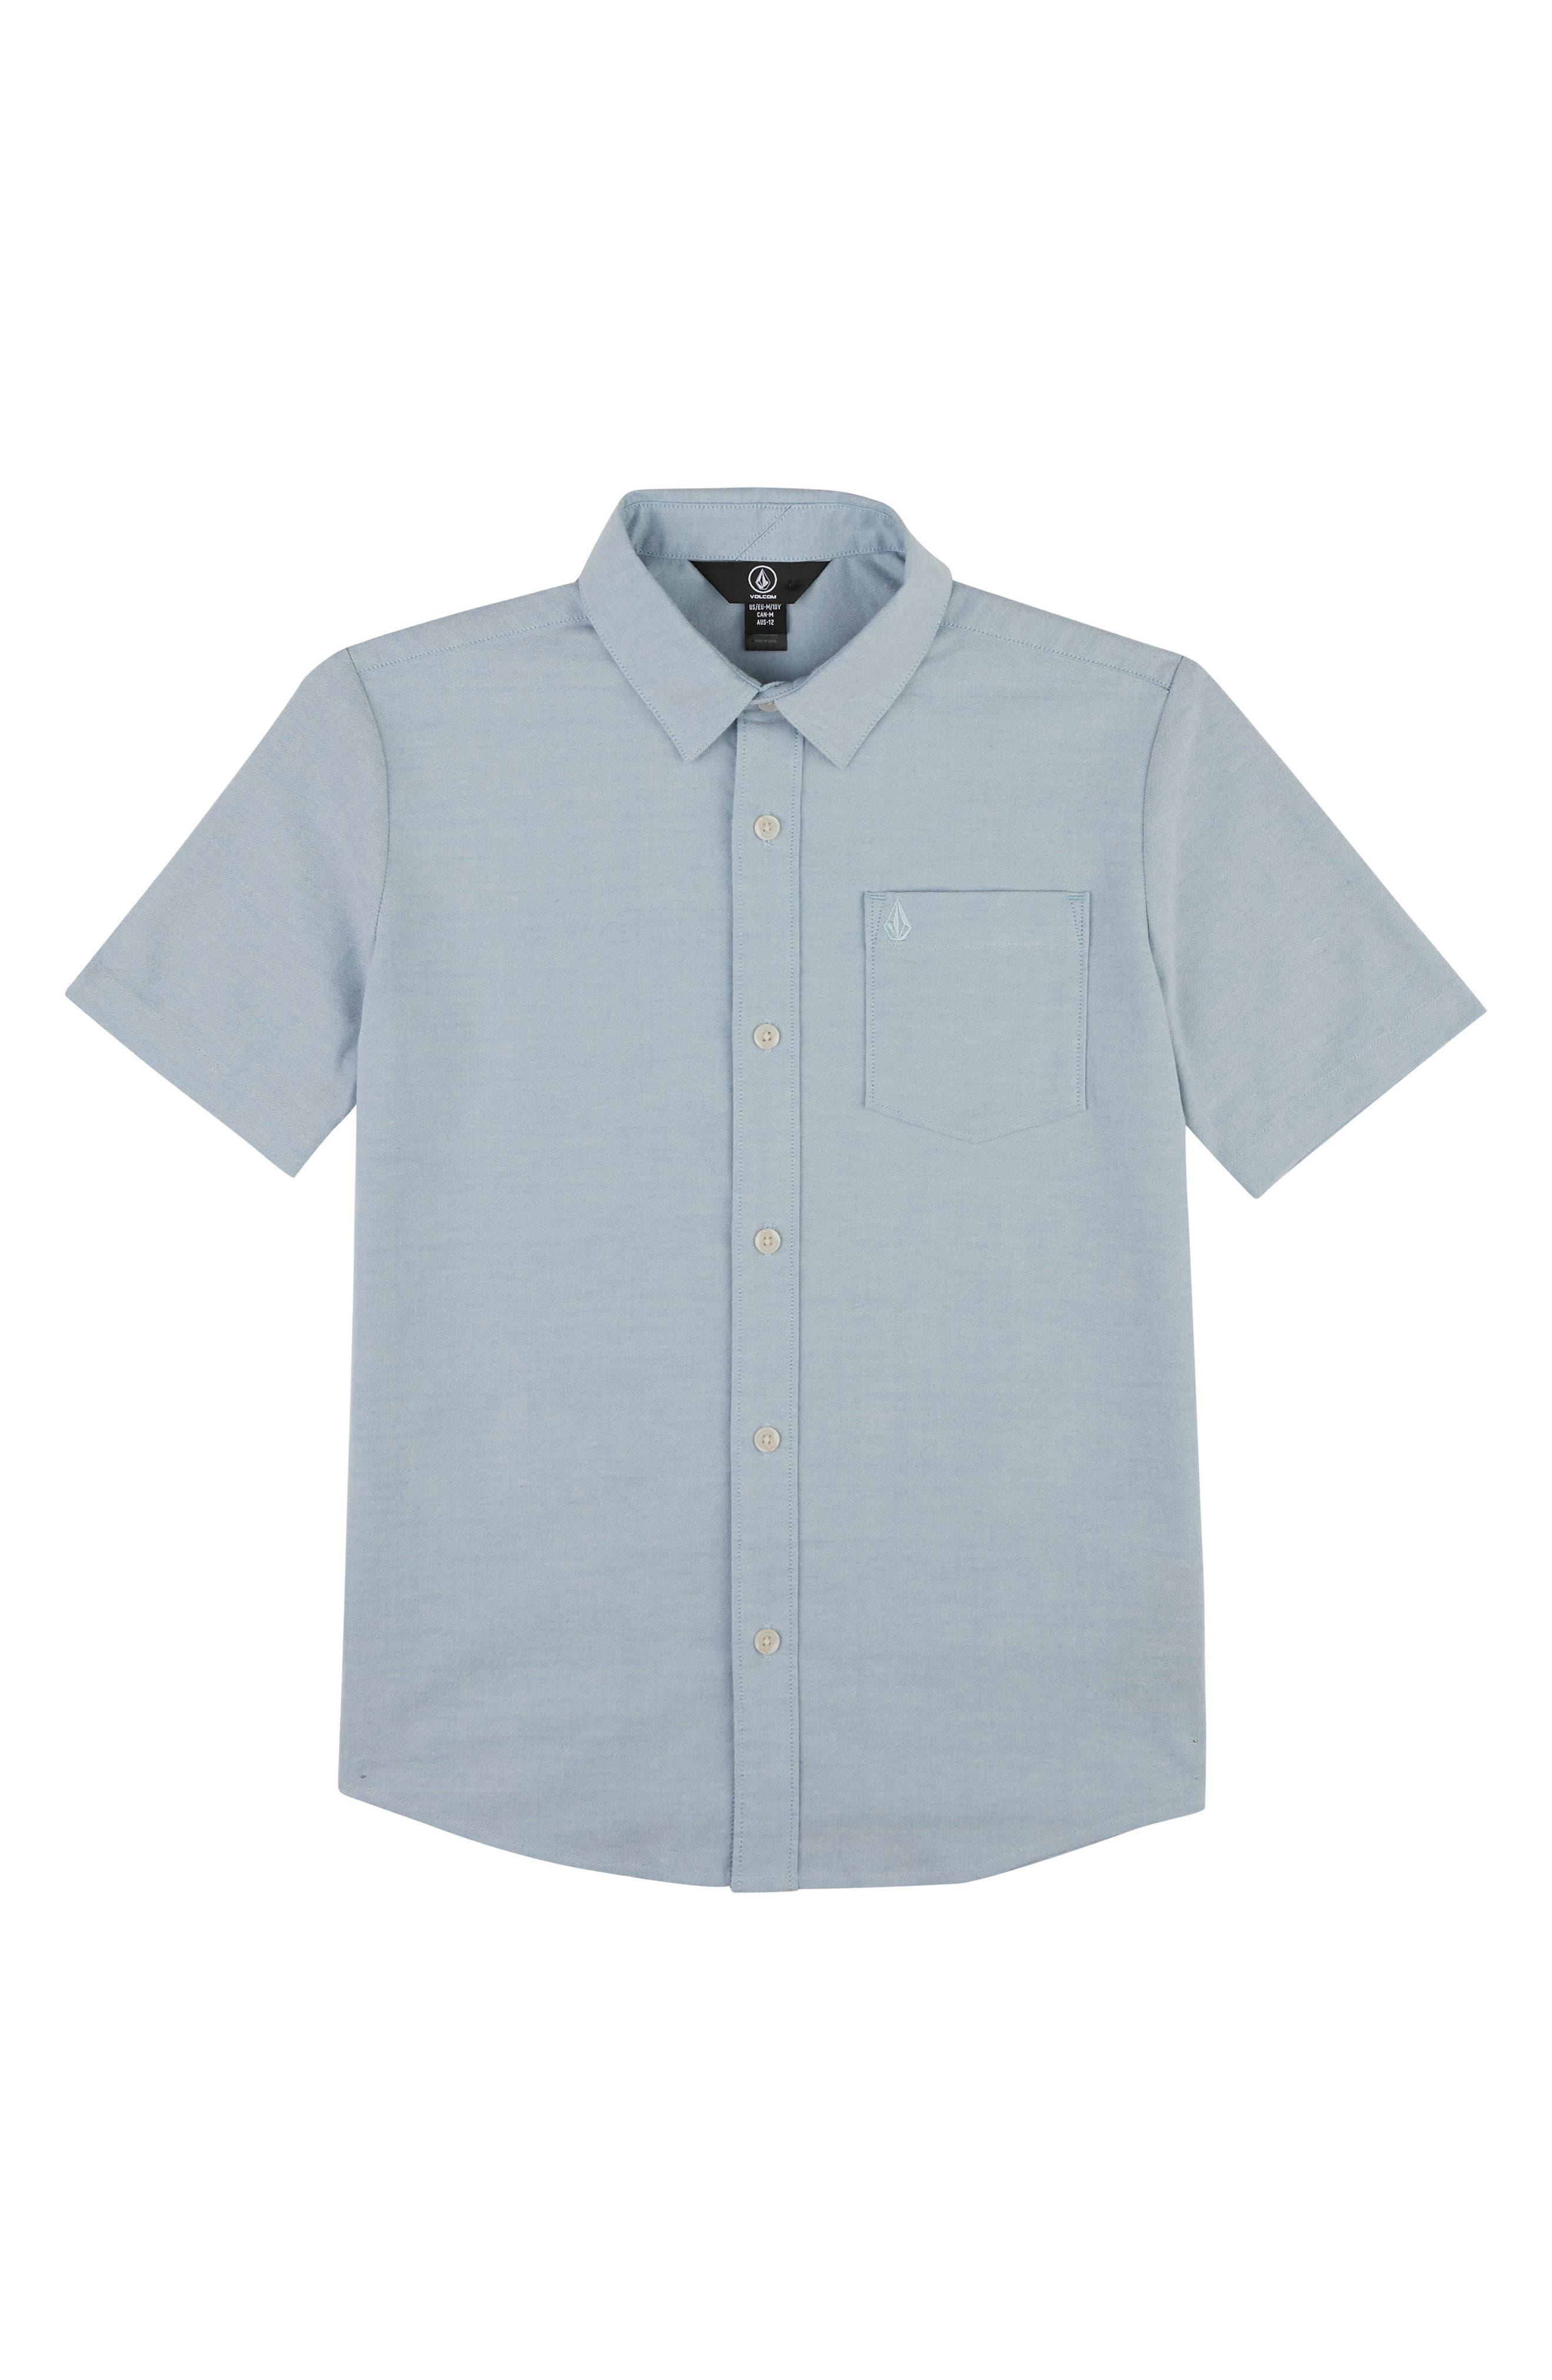 Everett Oxford Shirt,                             Main thumbnail 1, color,                             WRECKED INDIGO